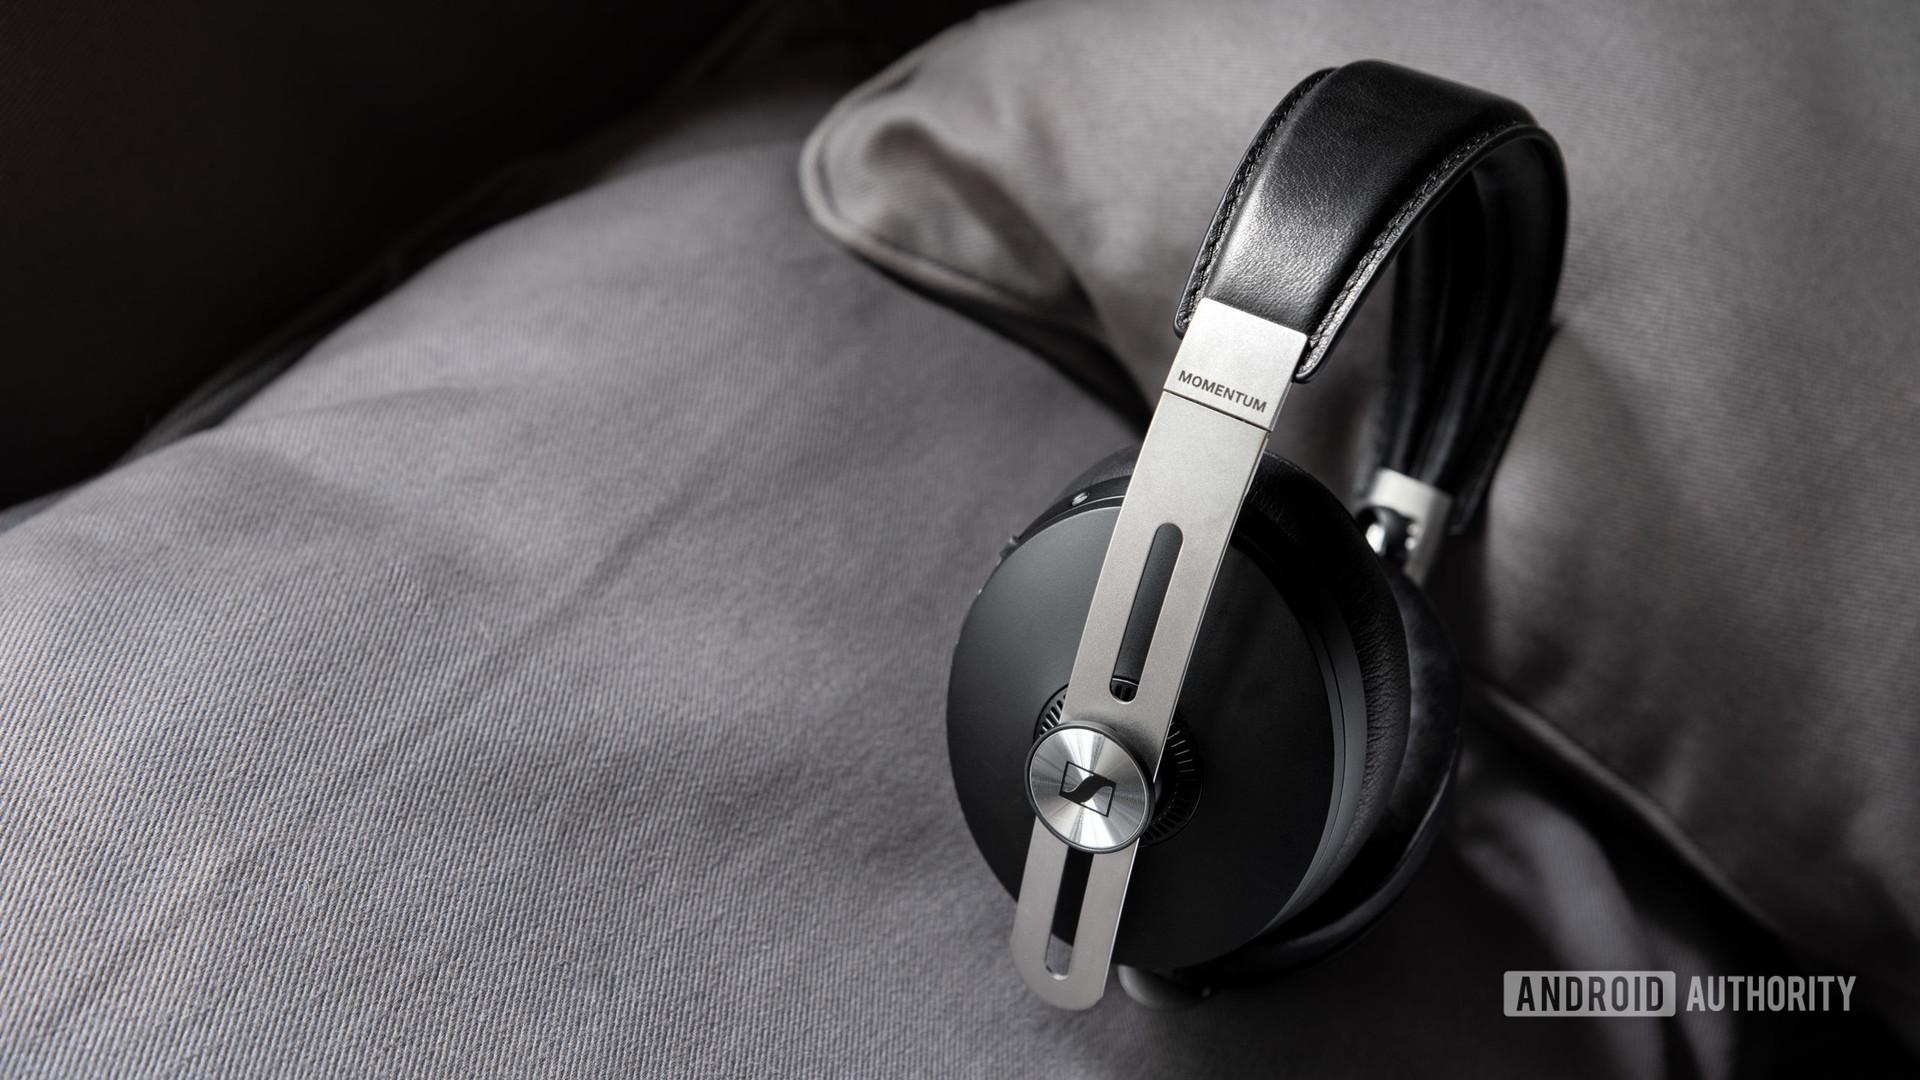 The Sennheiser Momentum Wireless 3 Bluetooth headphones in black rest against a gray surface.